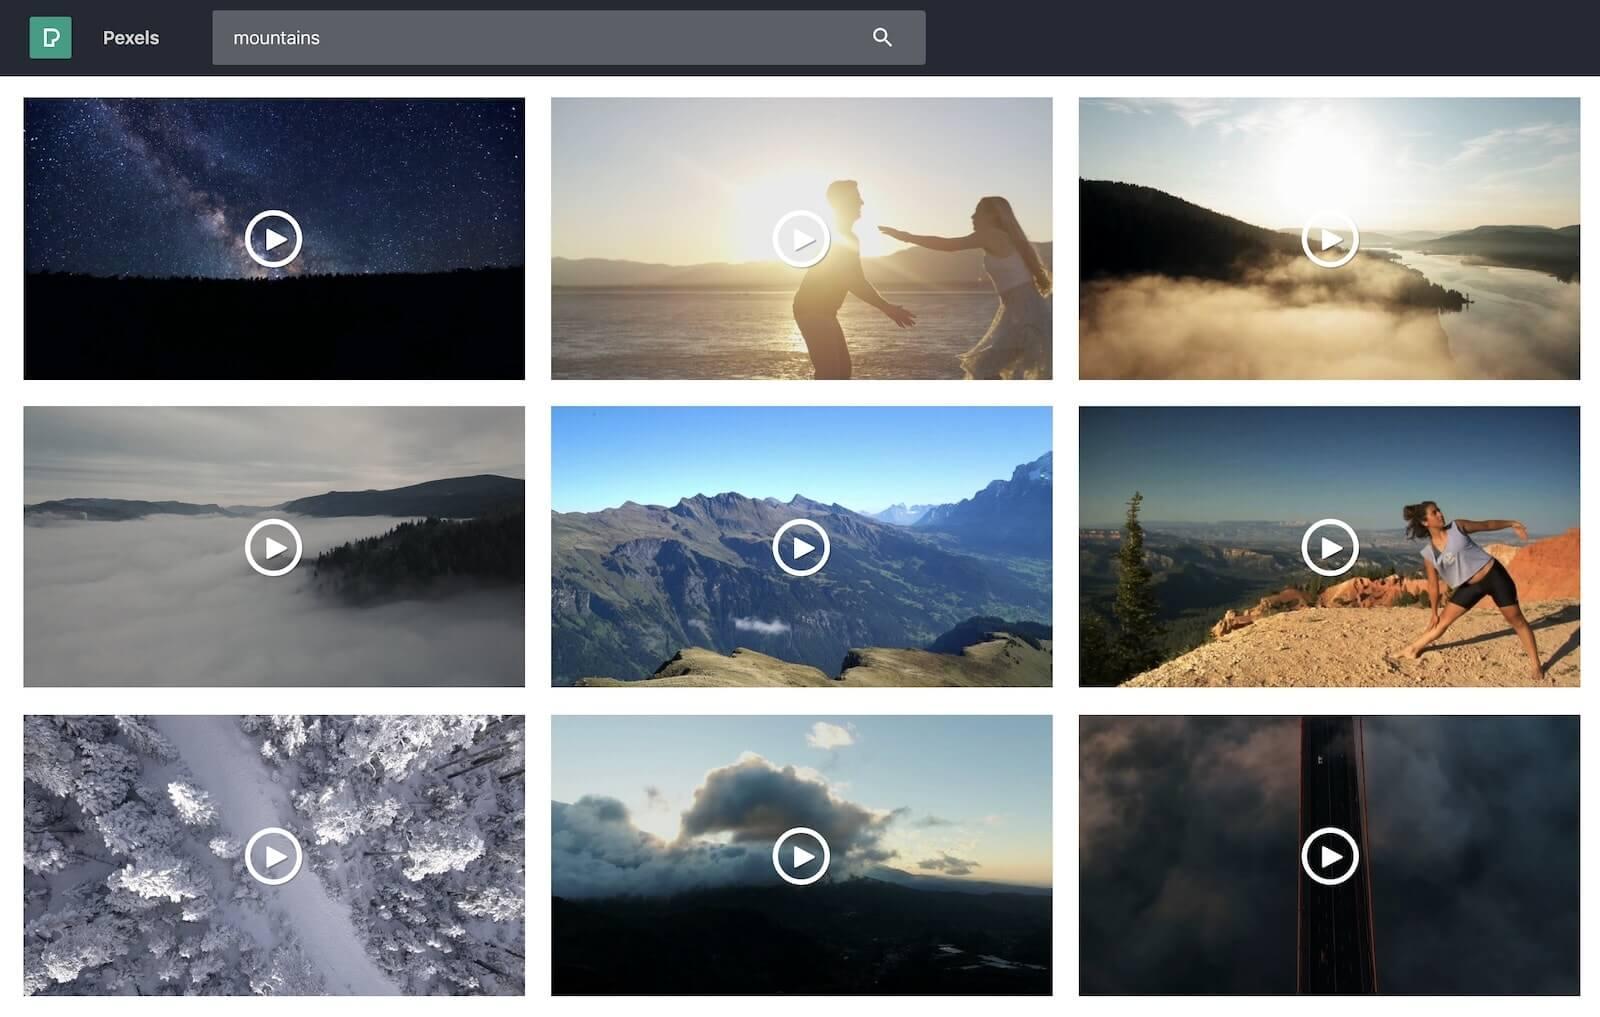 24 Websites to Find Affordable or Free B-Roll Footage - 7 - StudioBinder